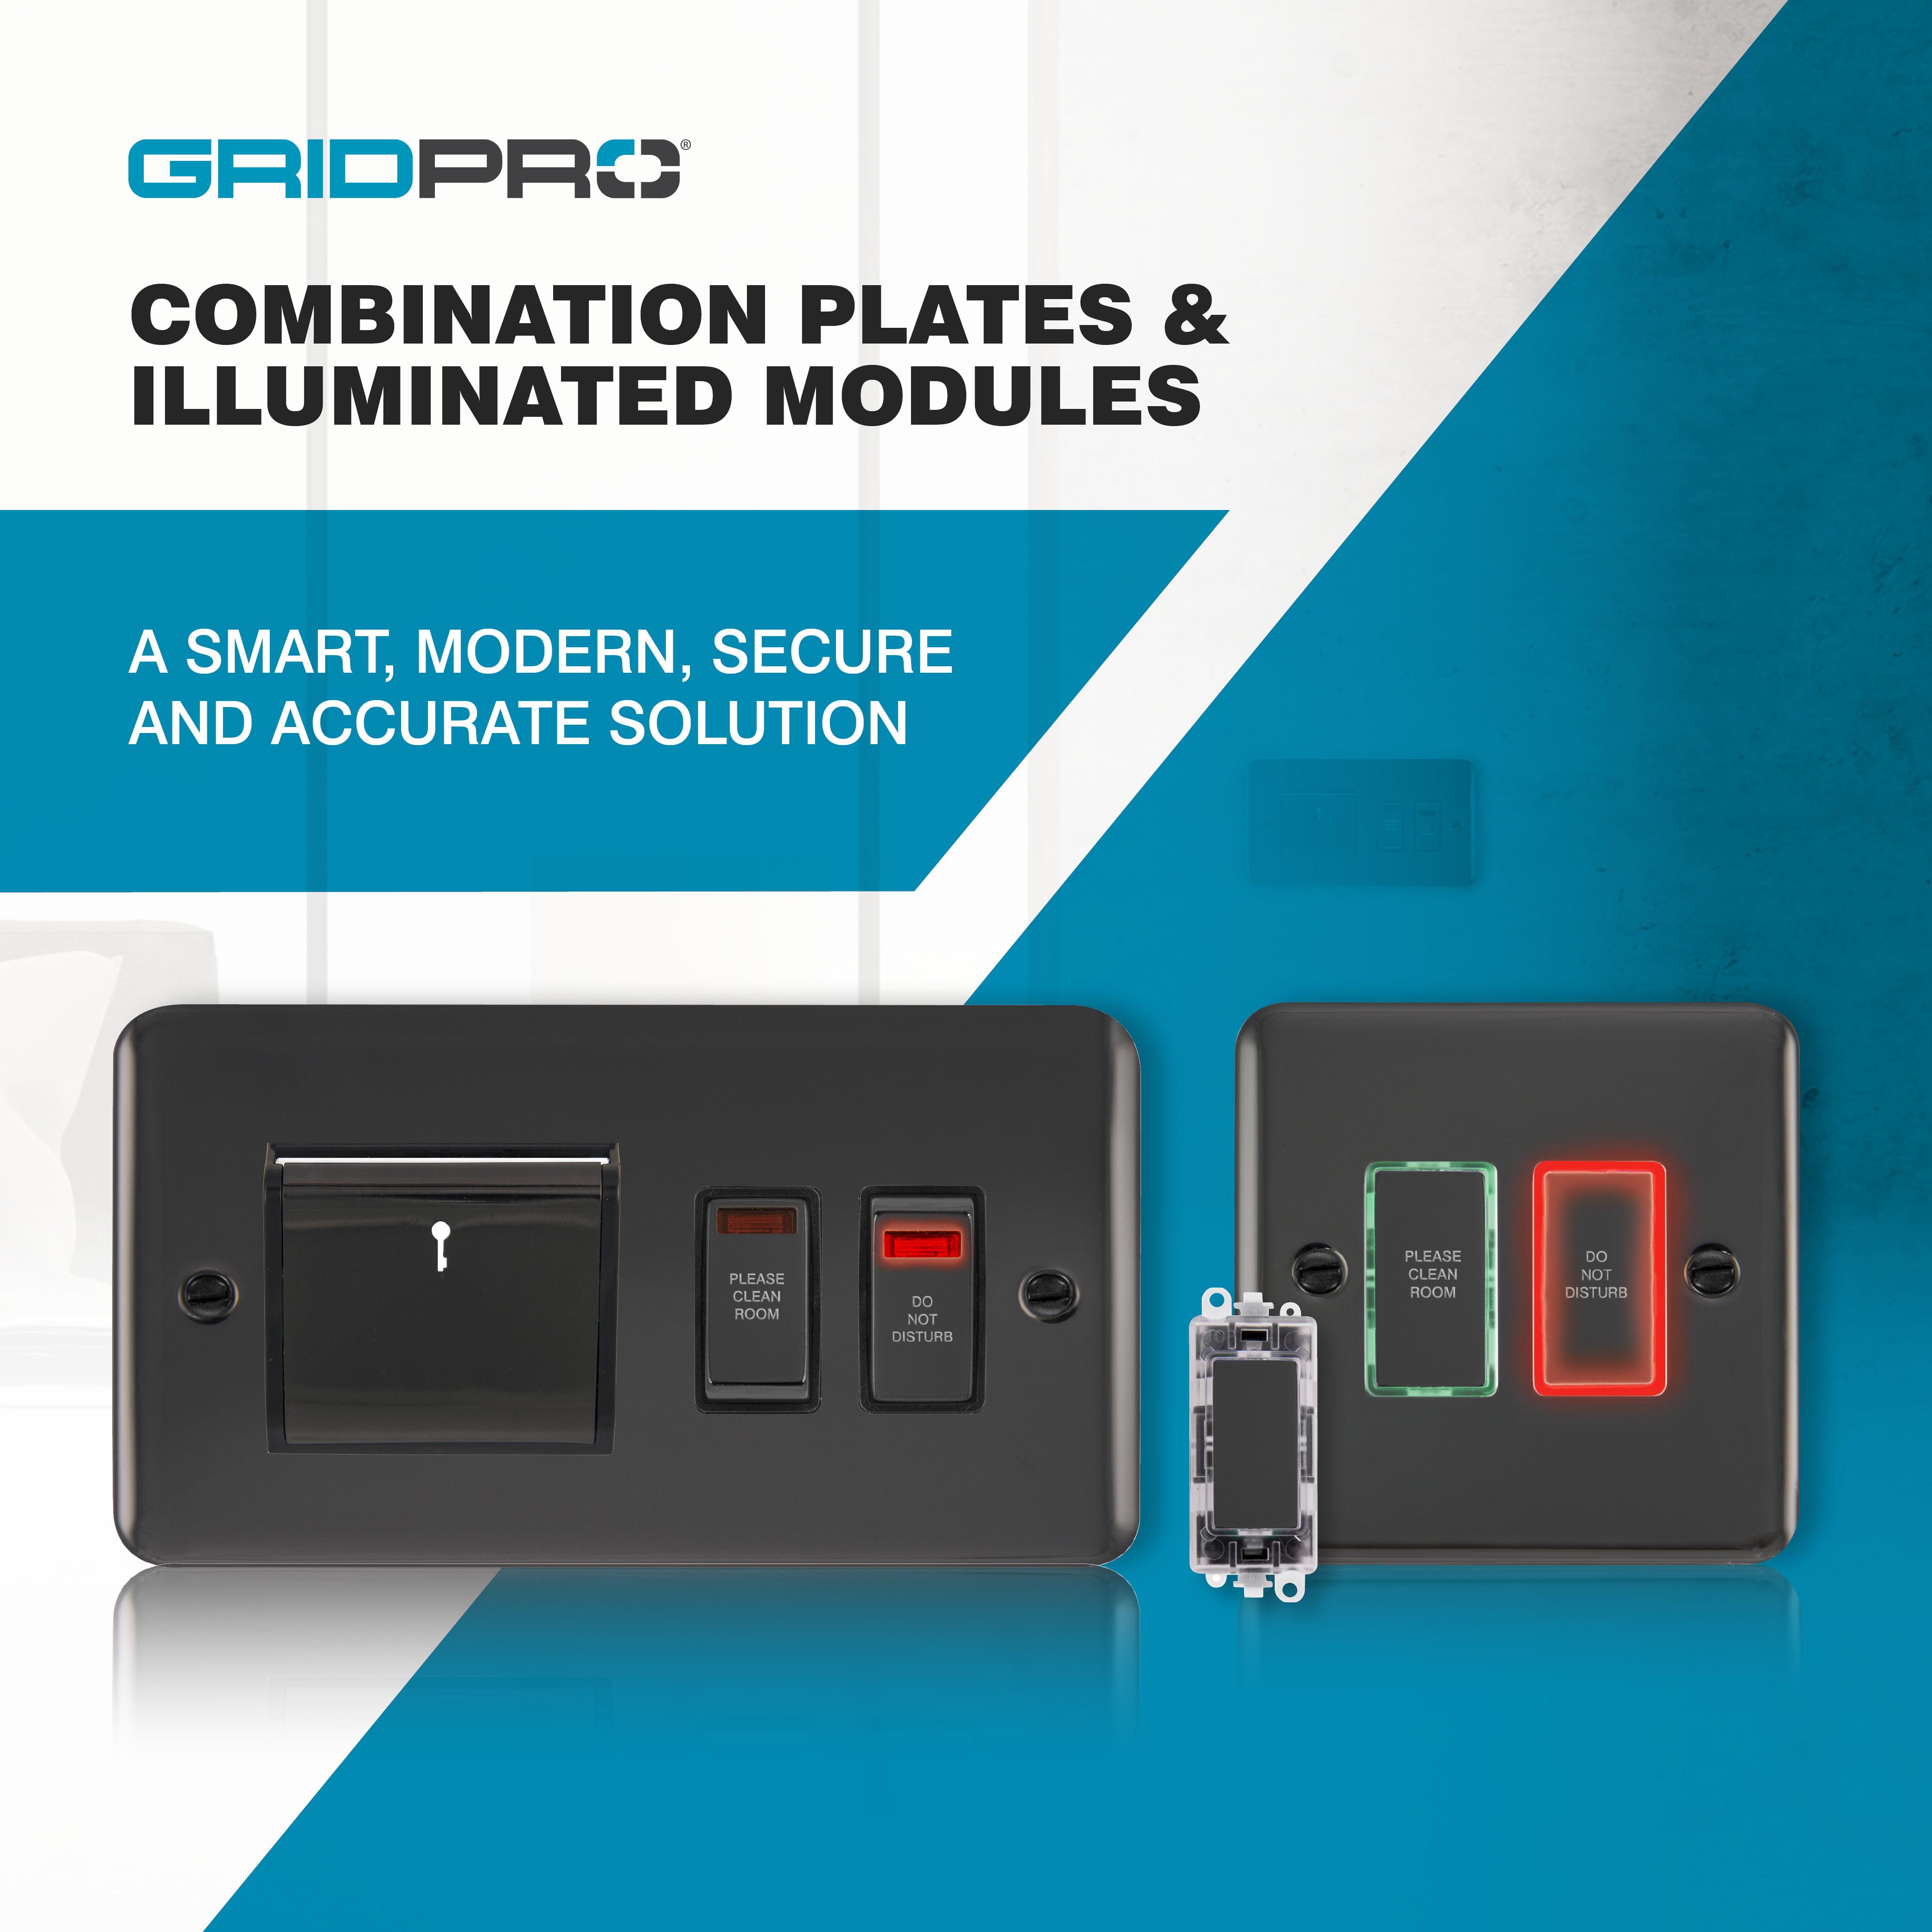 Scolmore GridPro